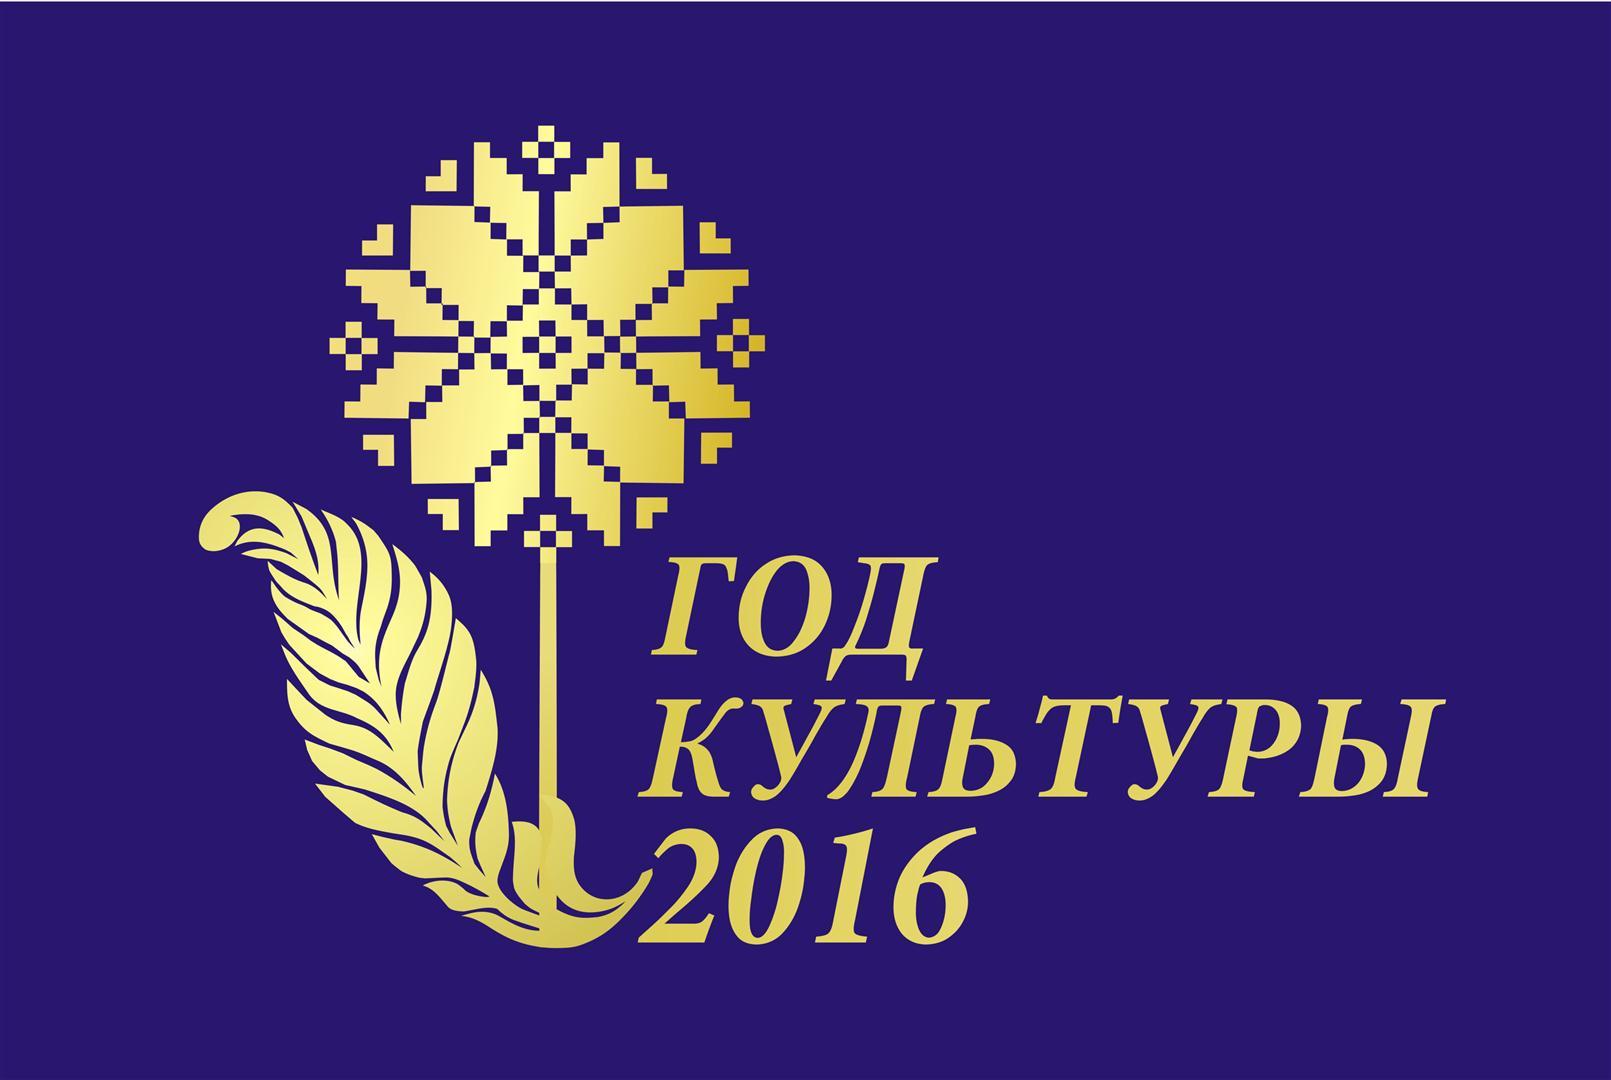 2016 – Год культуры Беларуси